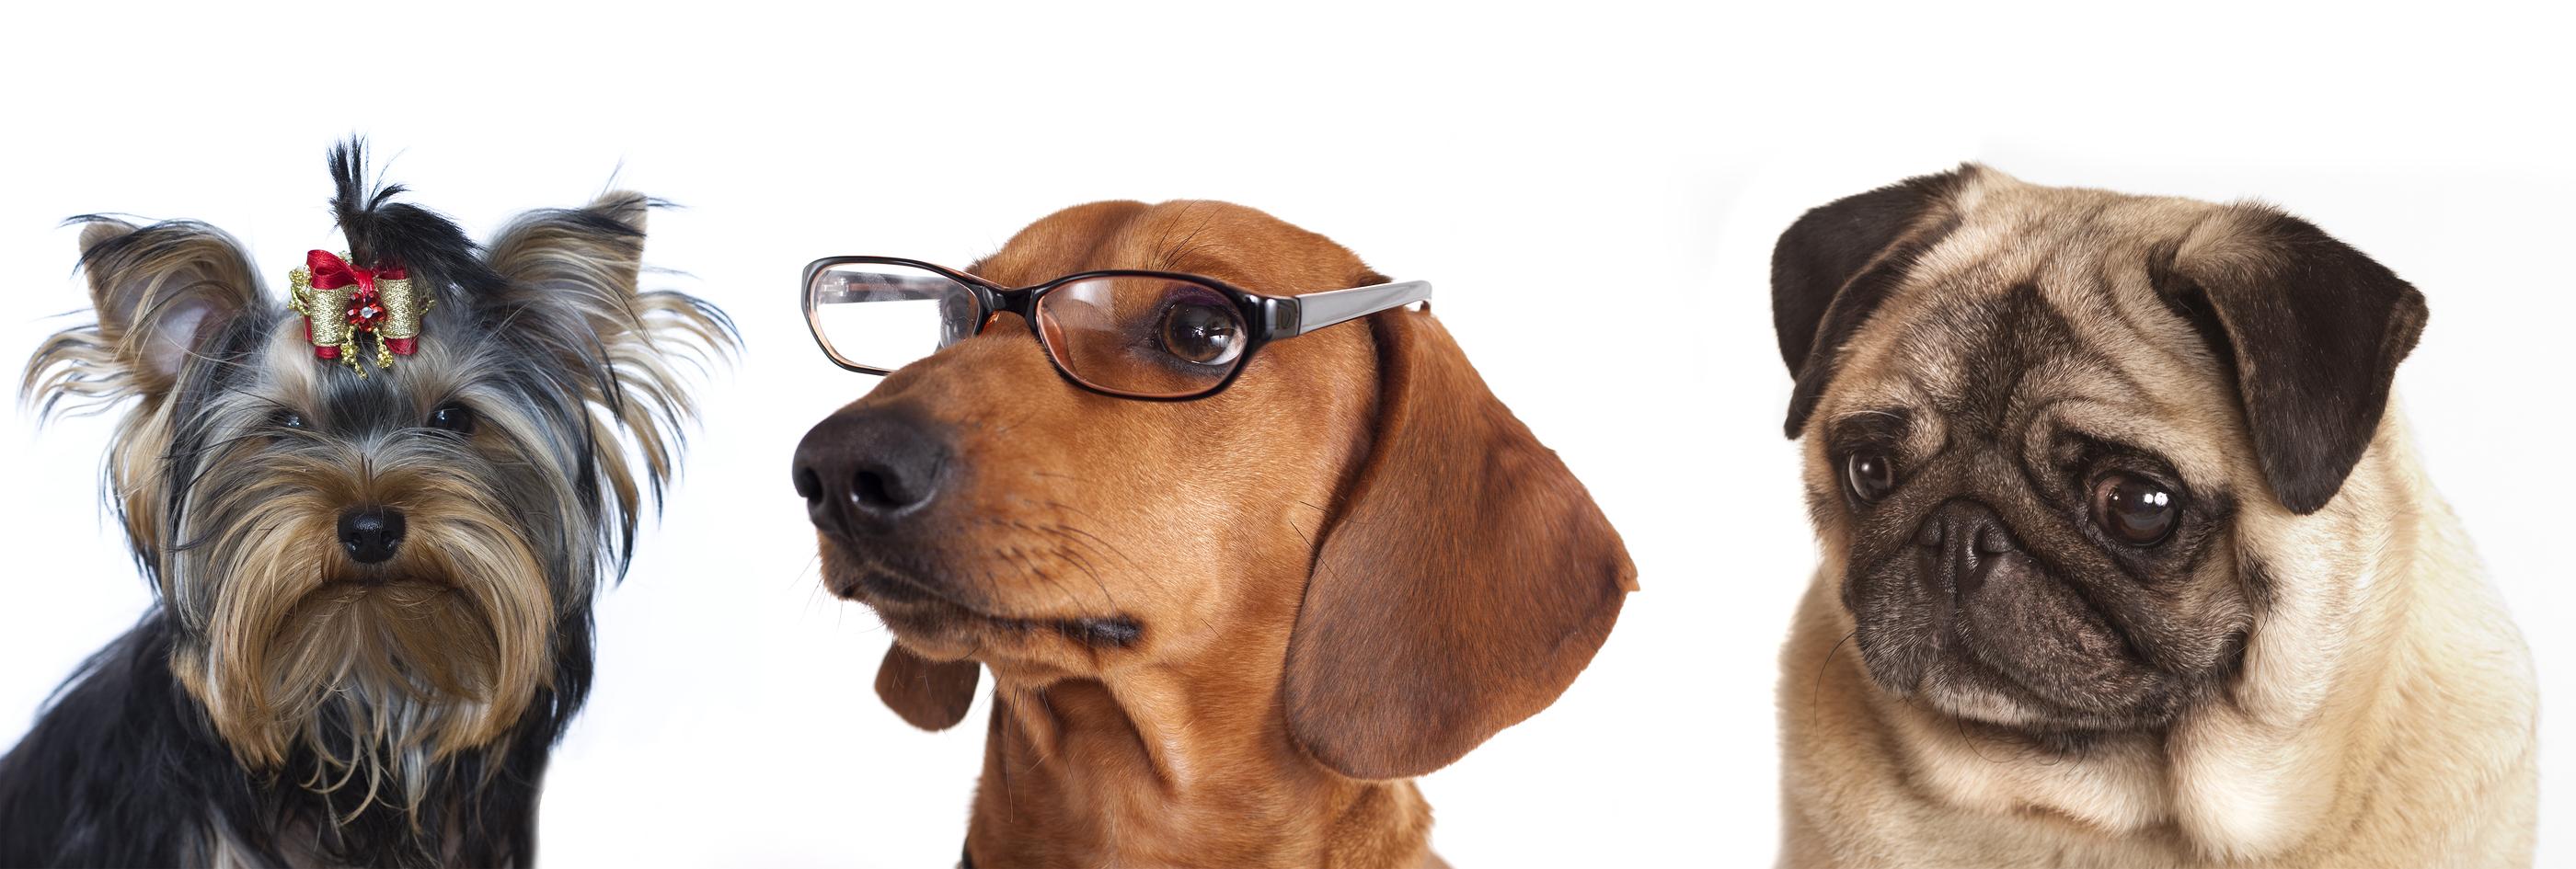 bigstock-dog-Dachshund-in-glasses-clos-19453334